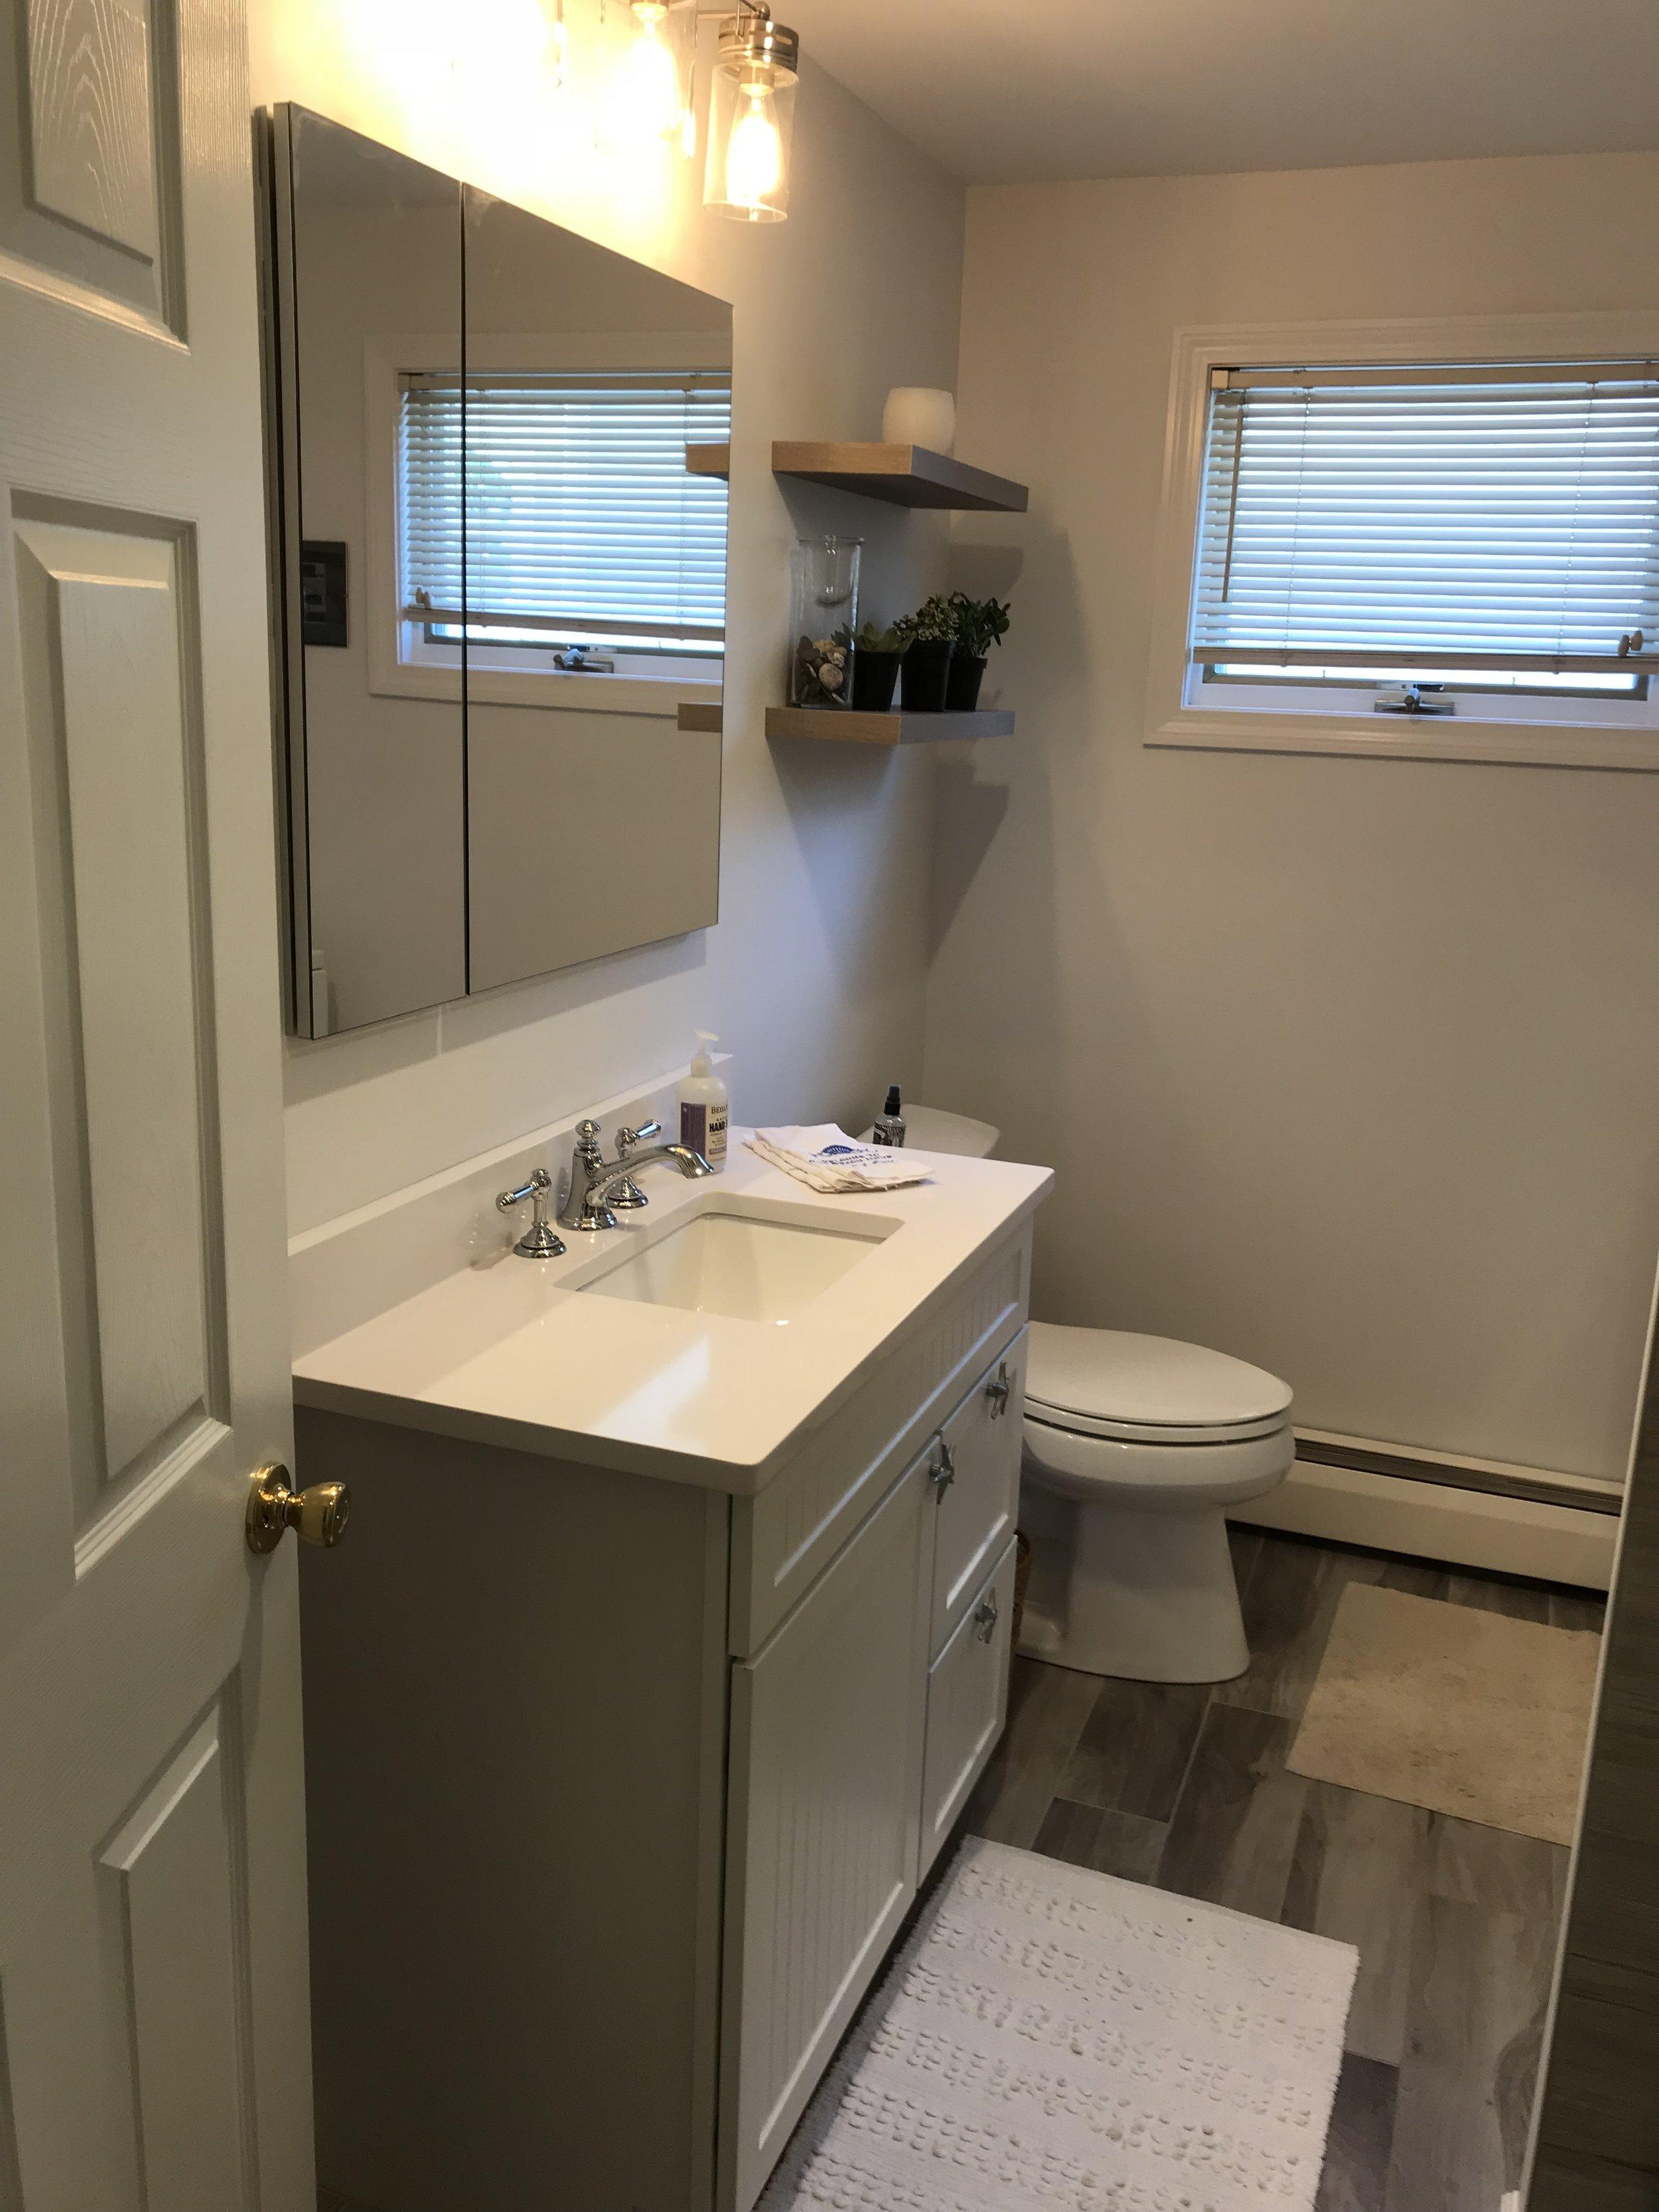 Shaw Remodeling - Bathroom Remodel in Niantic CT